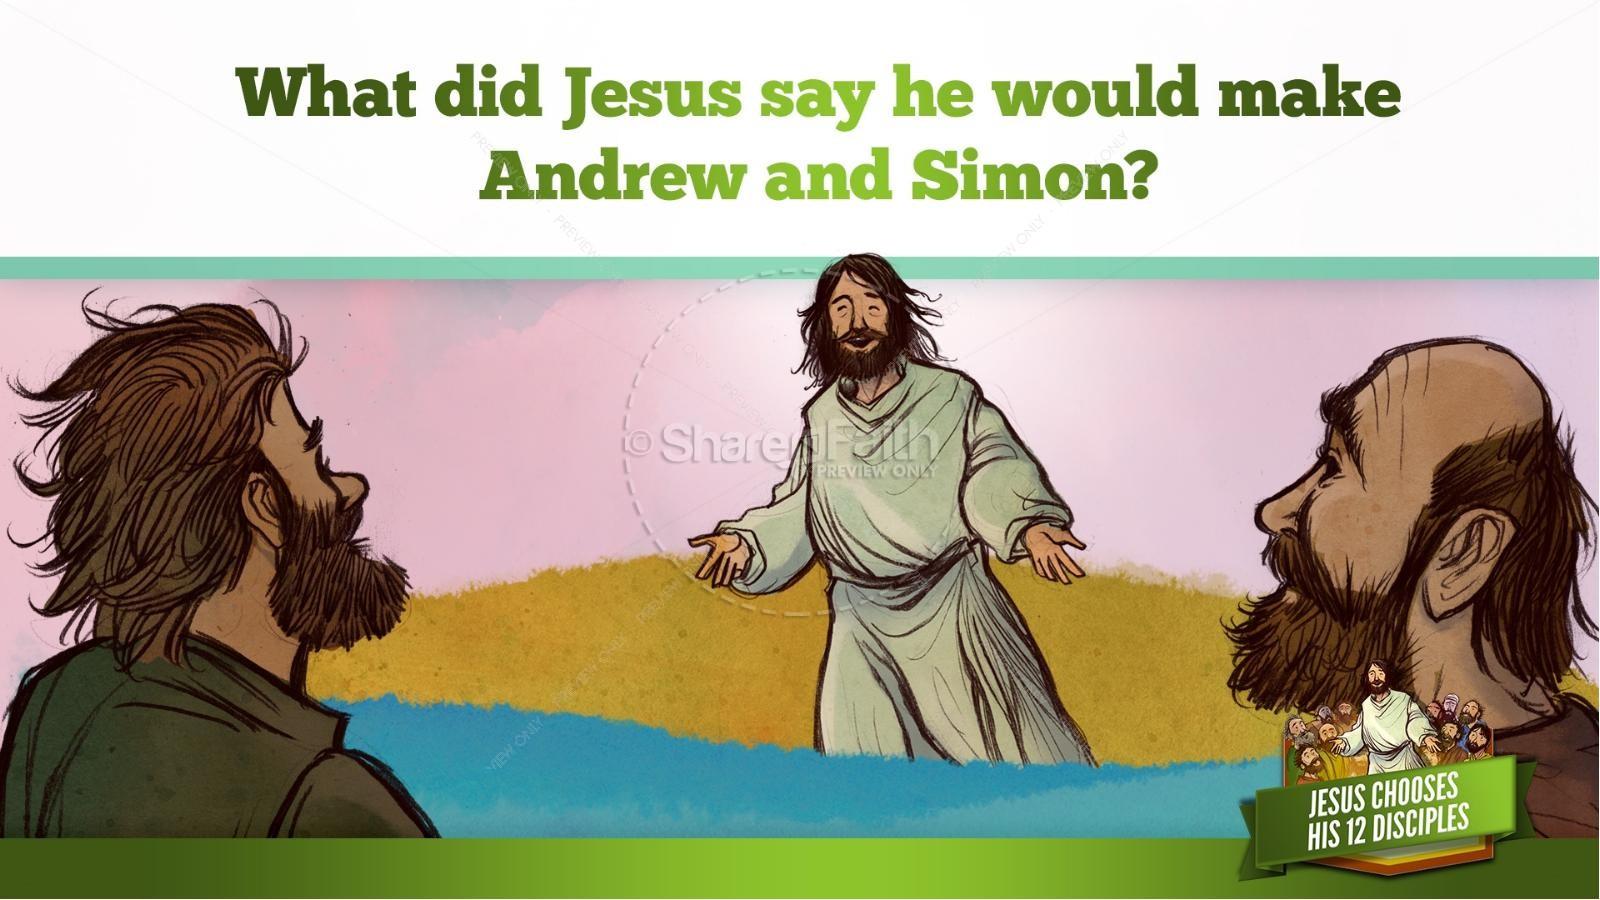 Jesus Chooses His 12 Disciples Kids Bible Story   slide 14